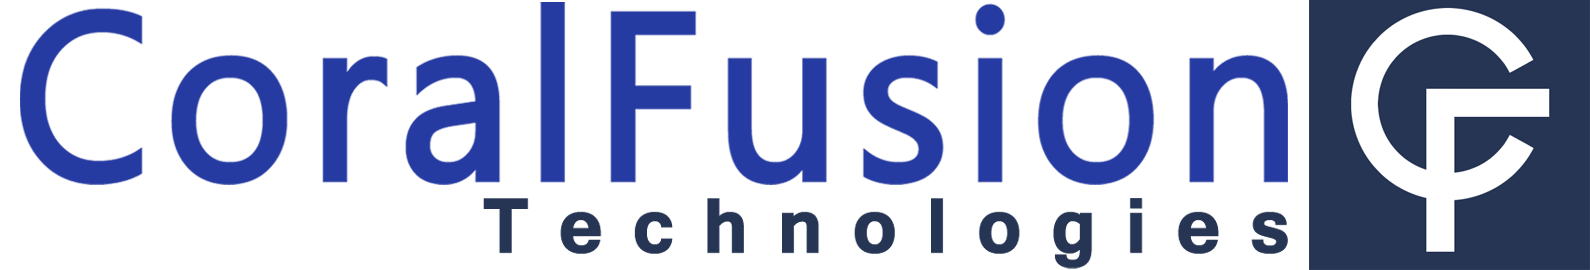 CoralFusion Technologies